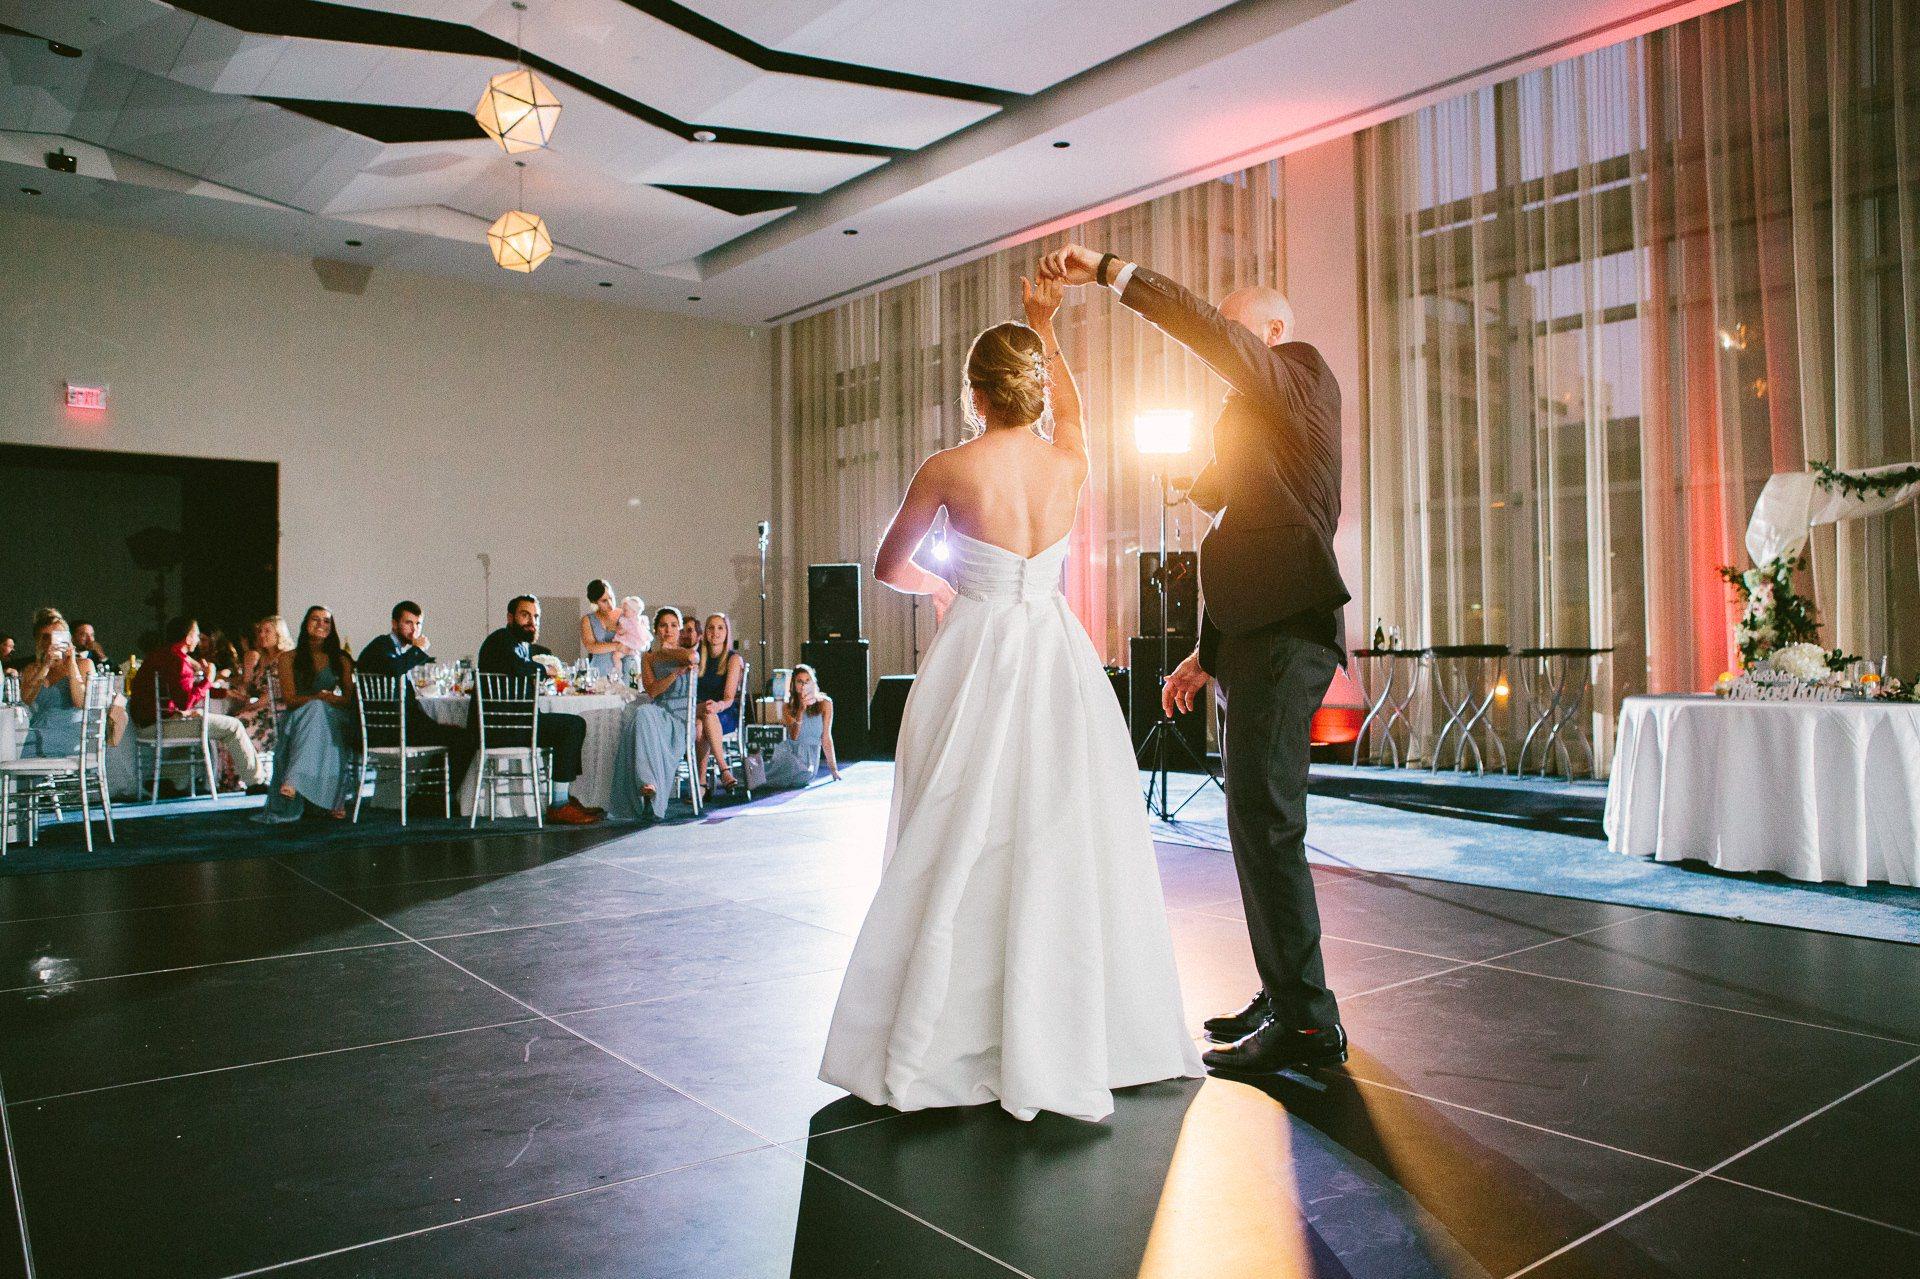 Dowtown Hilton Cleveland Wedding Photographer 2 31.jpg